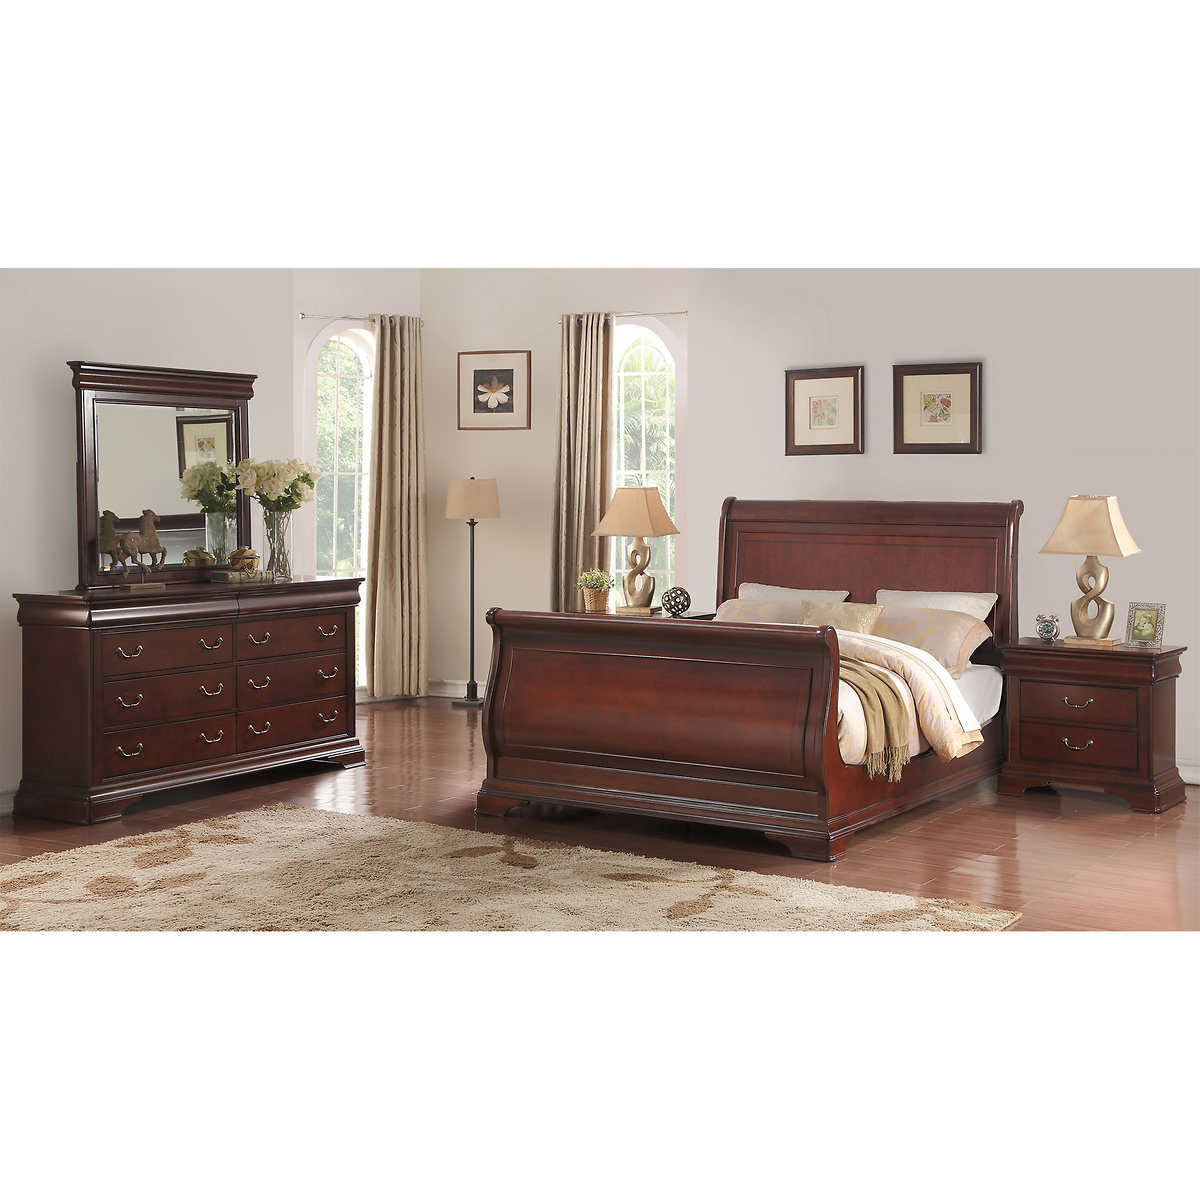 cal king bedroom sets  costco - madeline piece cal king bedroom set